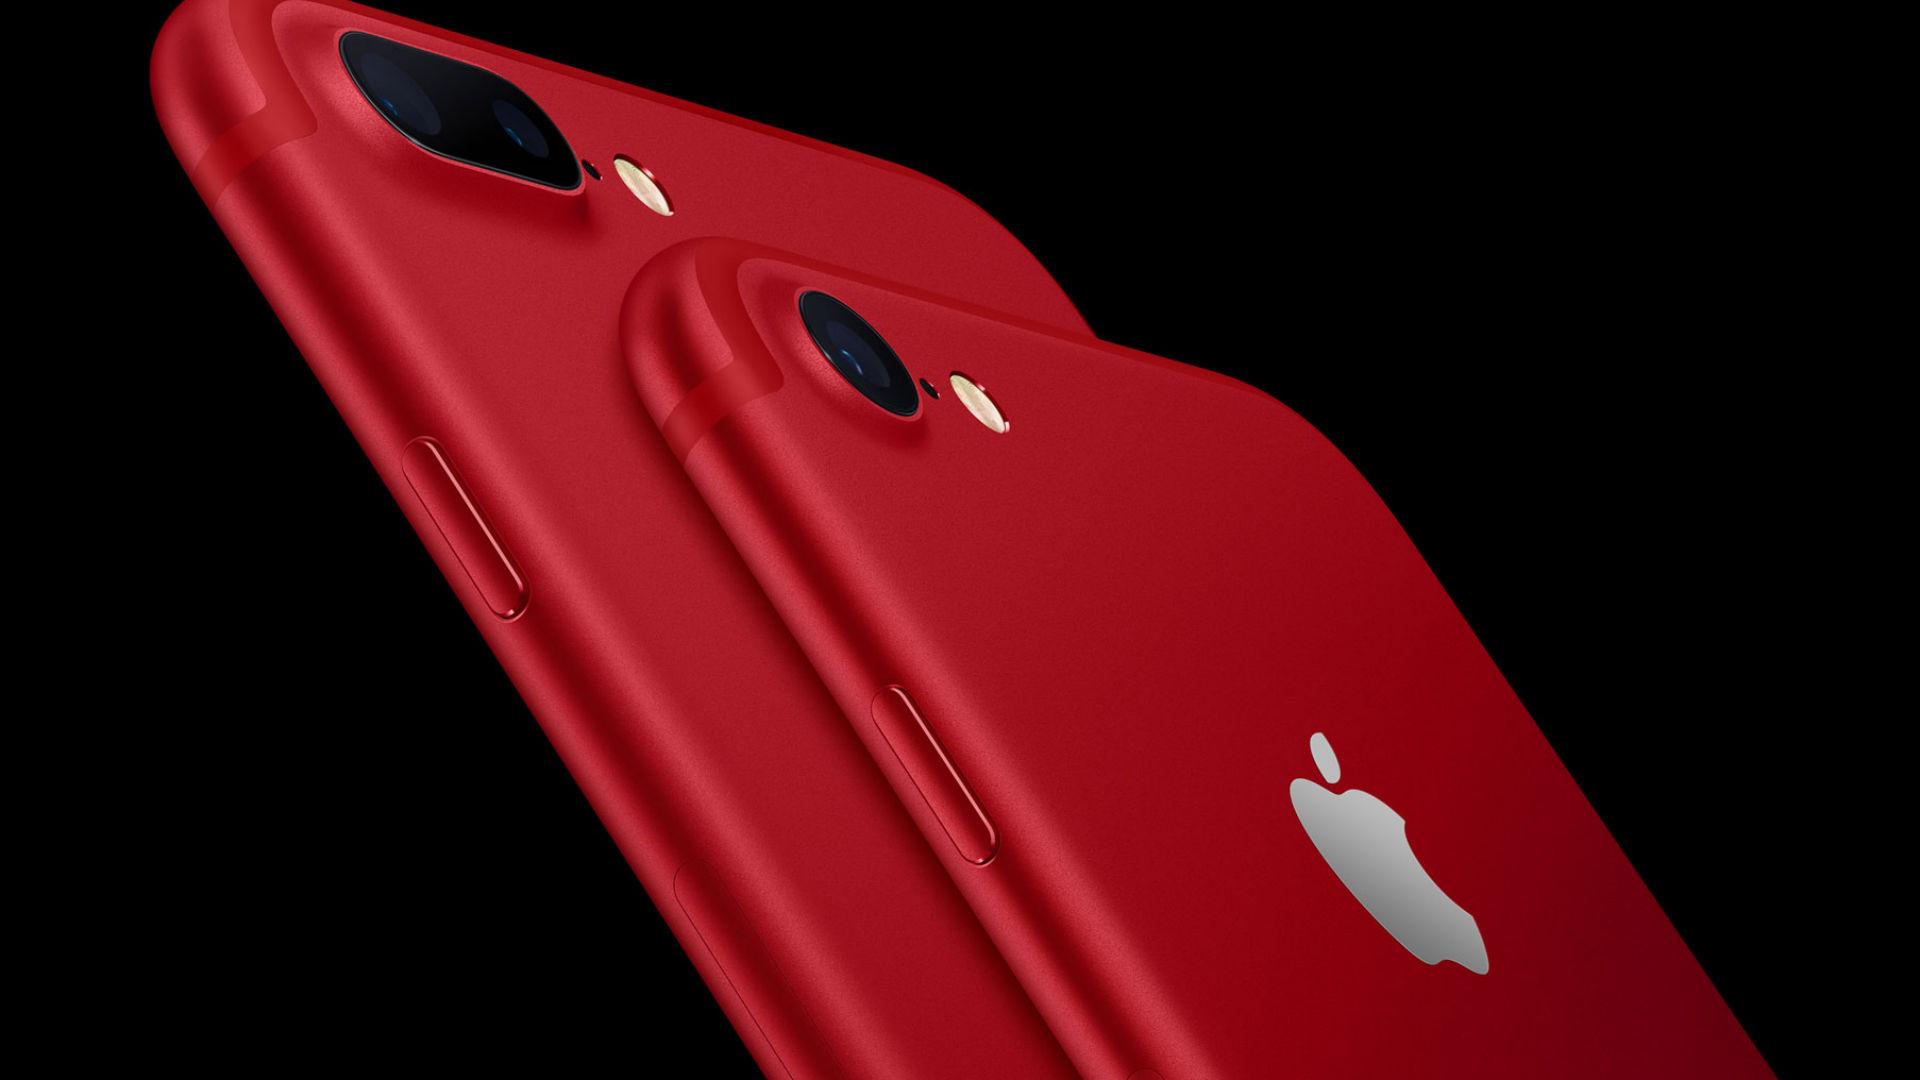 ApplelanzauniPhone7yuniPadencolorrojoapoyandolaluchacontraelsida-Univision